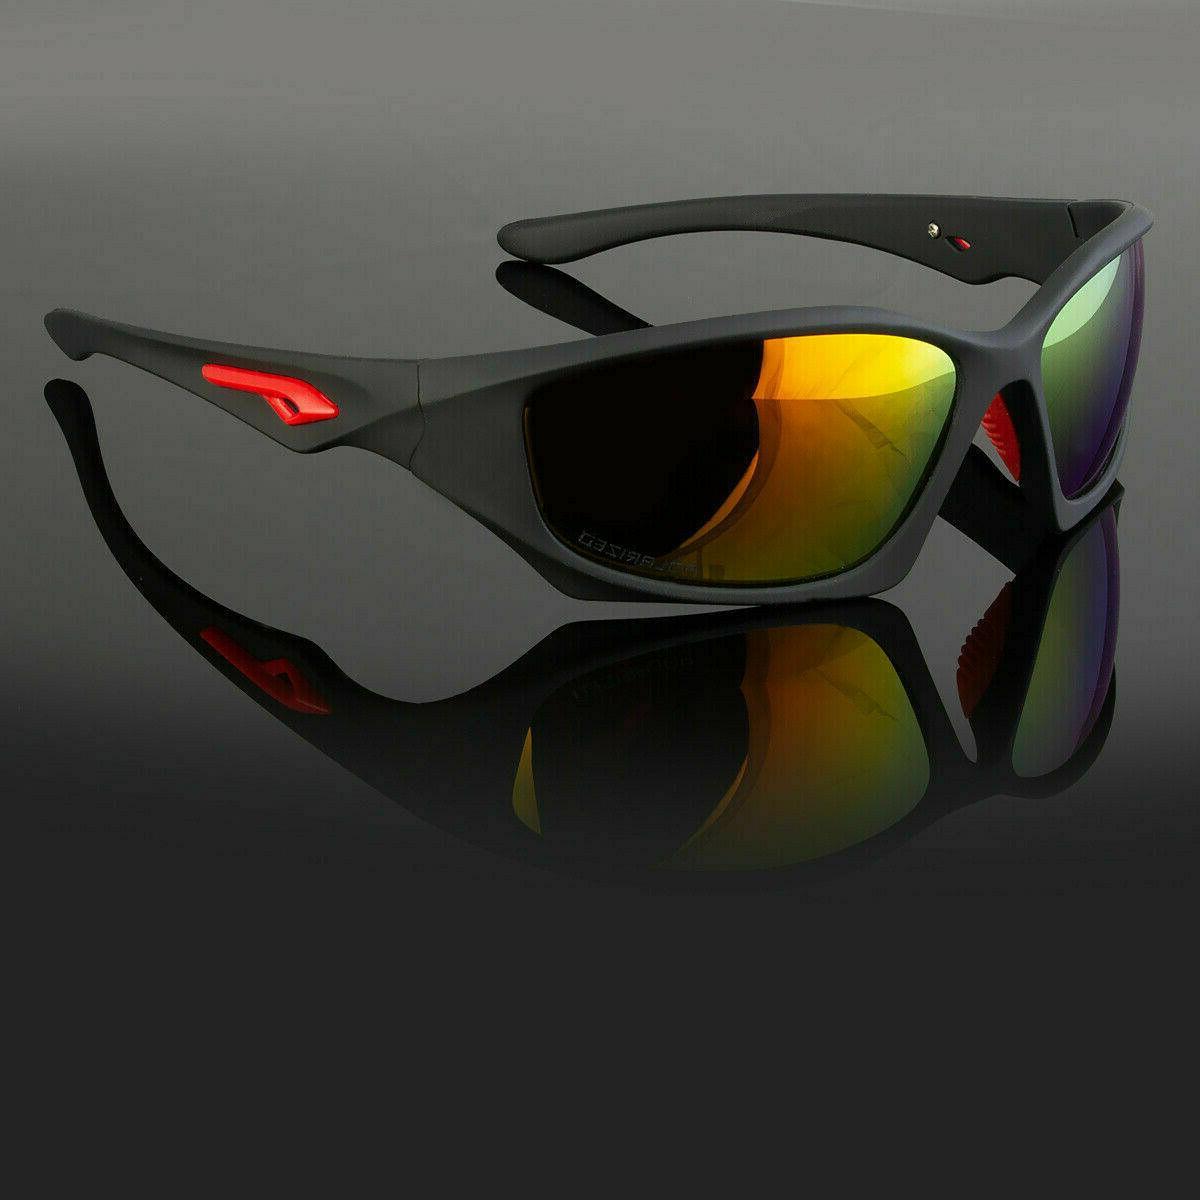 New Polarized Sports Eyewear Driving Sunglasses Wrap Around Glasses